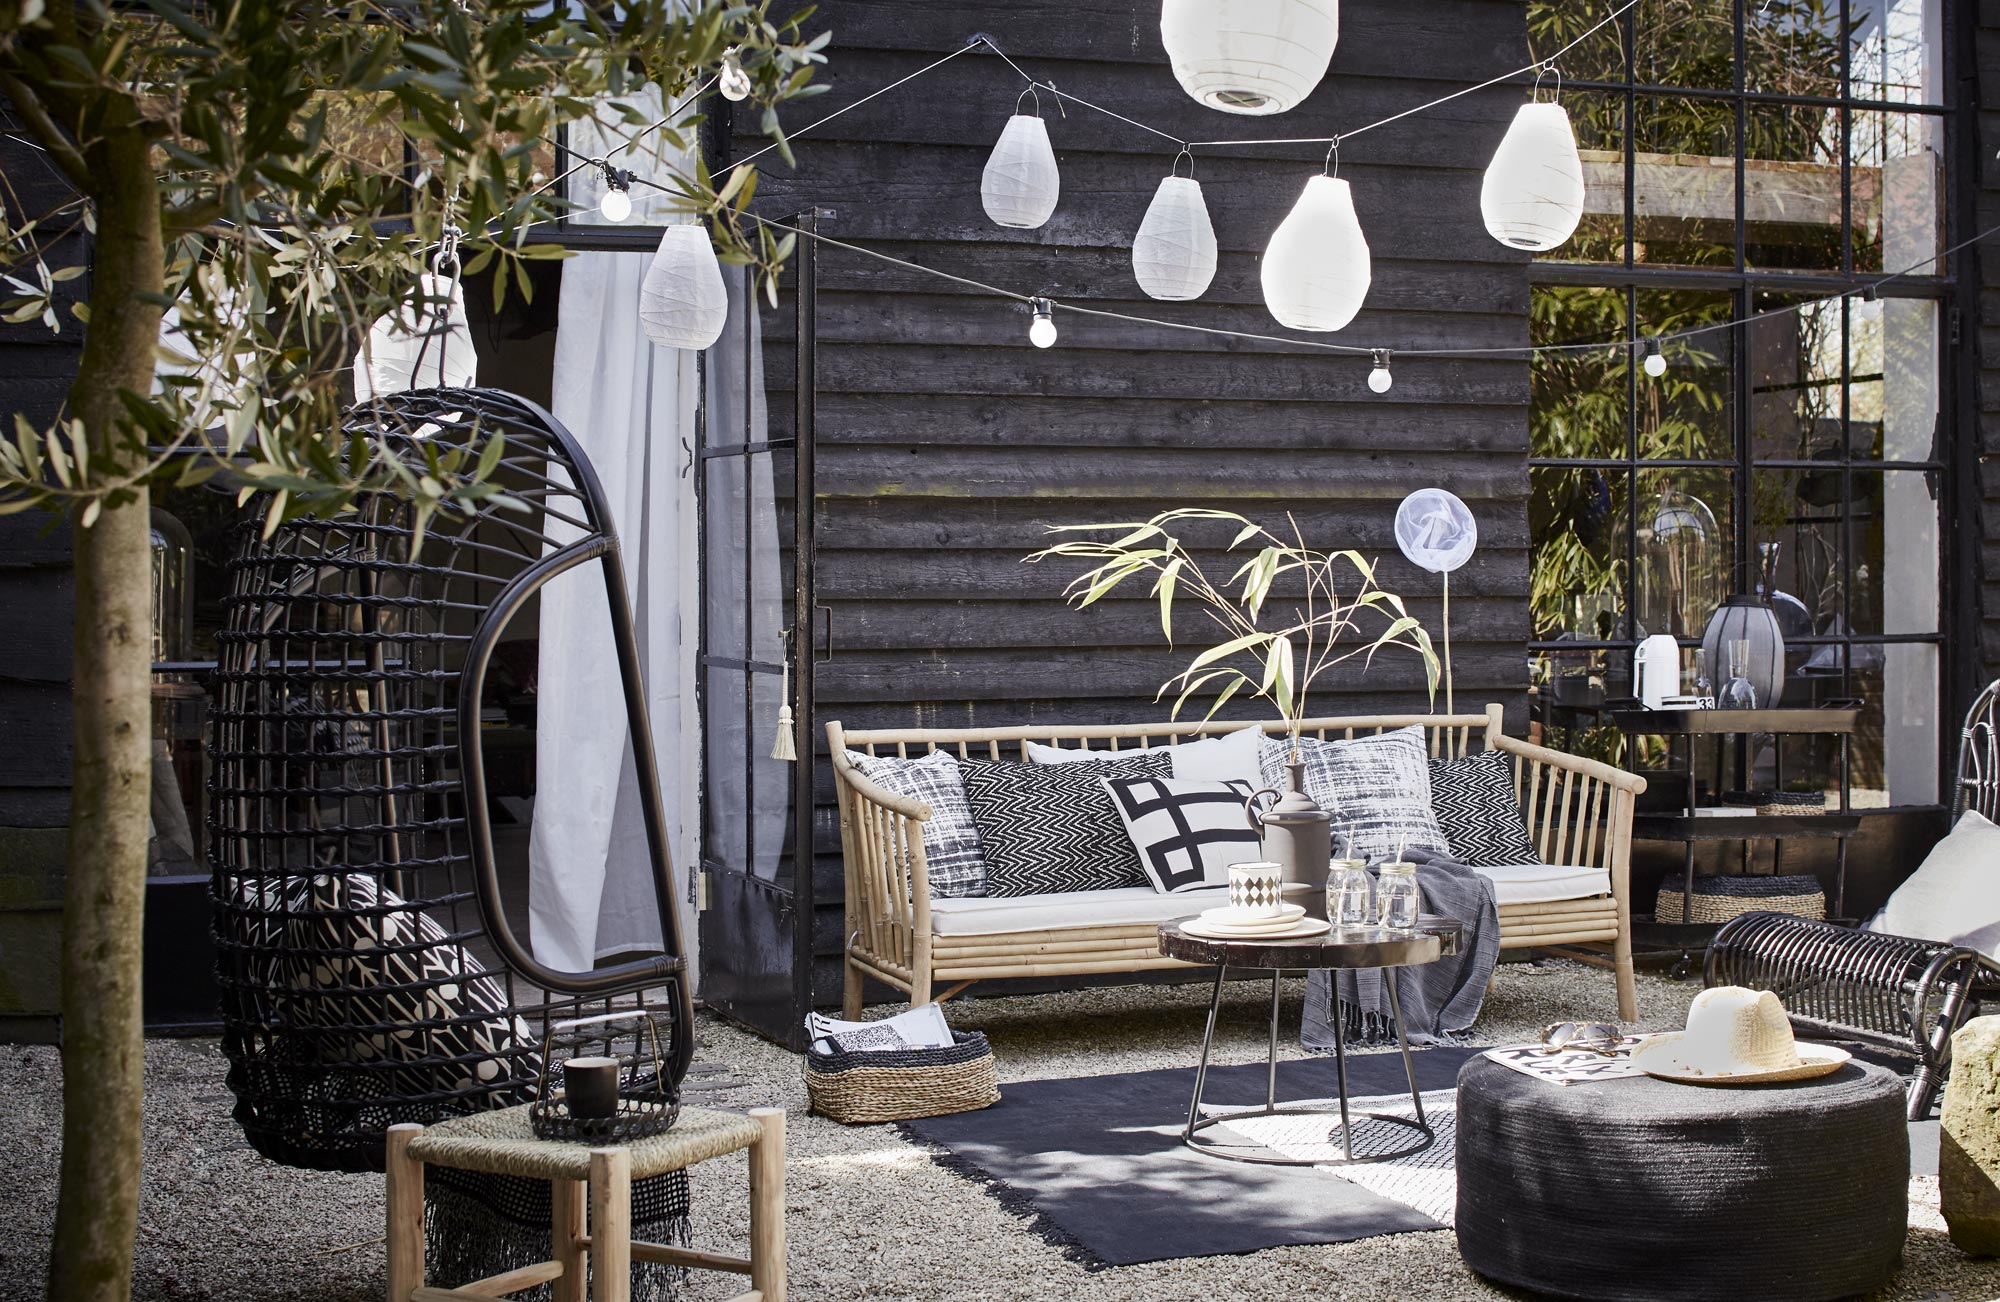 De gezellige vtwonen tuin homease - Na de zwarte bank ...